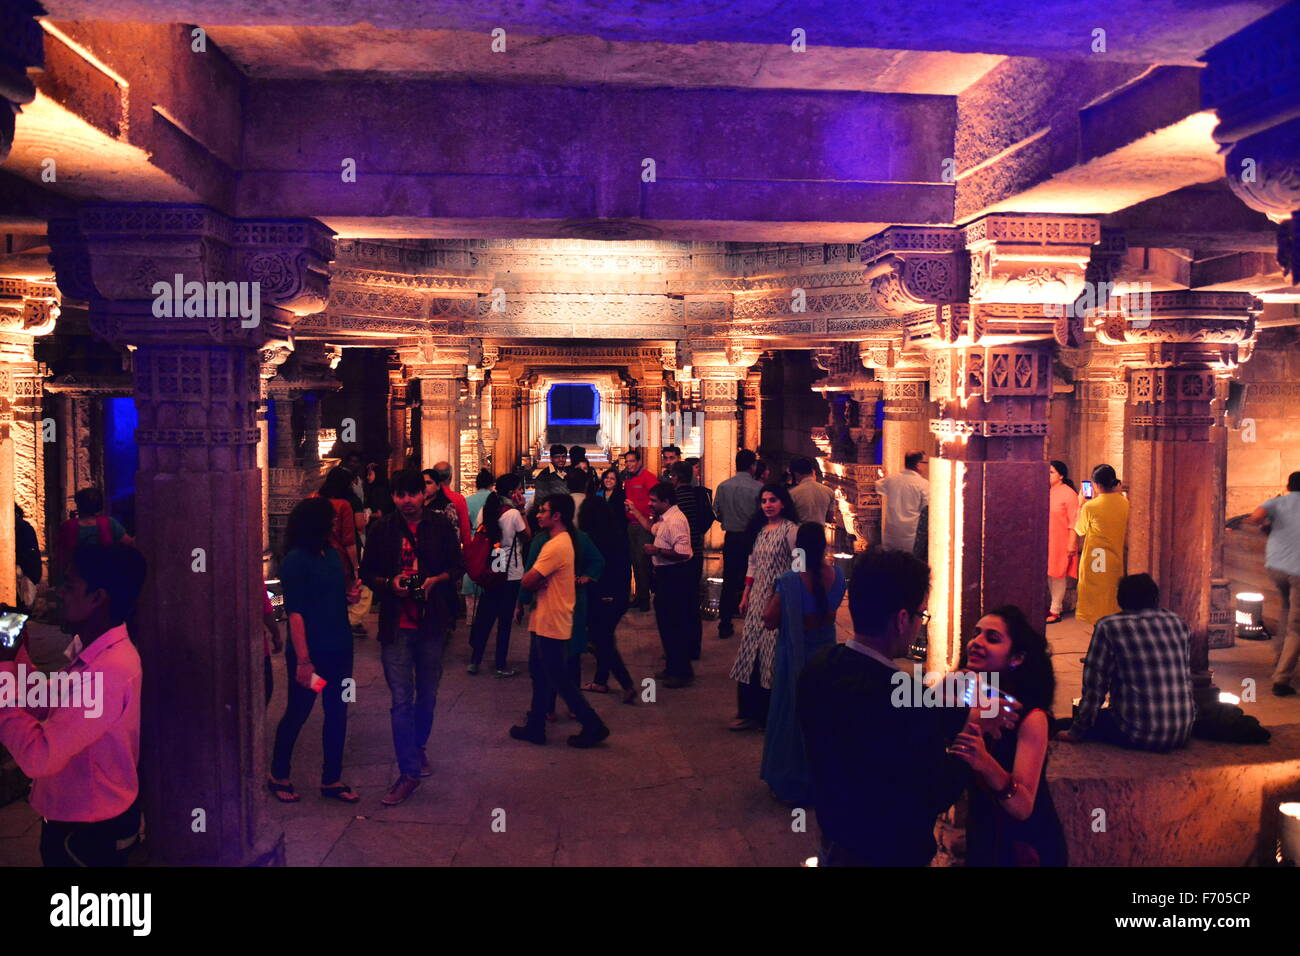 Ahmedabad, India, 21st Nov, 2015. The sounds of tabla, santoor and kartal melted effortlessly with keyboard, guitar - Stock Image